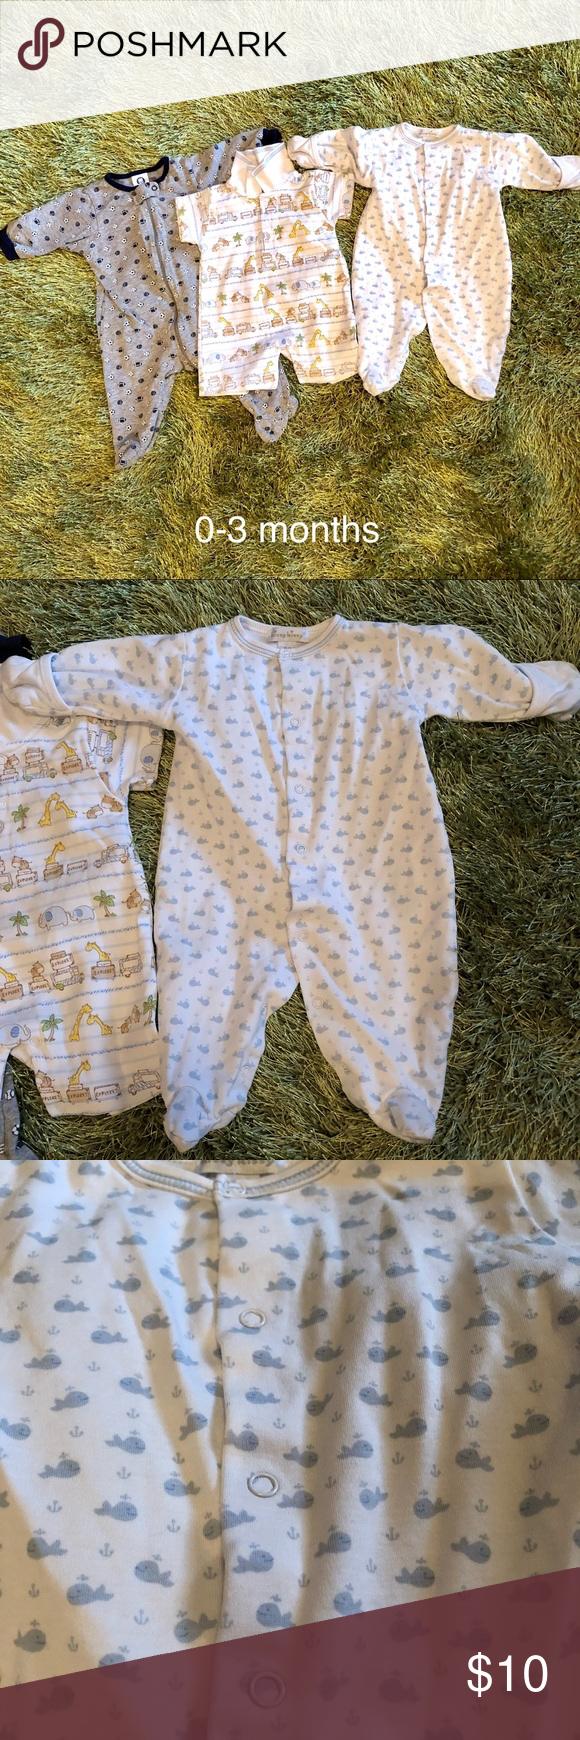 db4b57fd4 Baby boys clothing bundle size 0-3 months